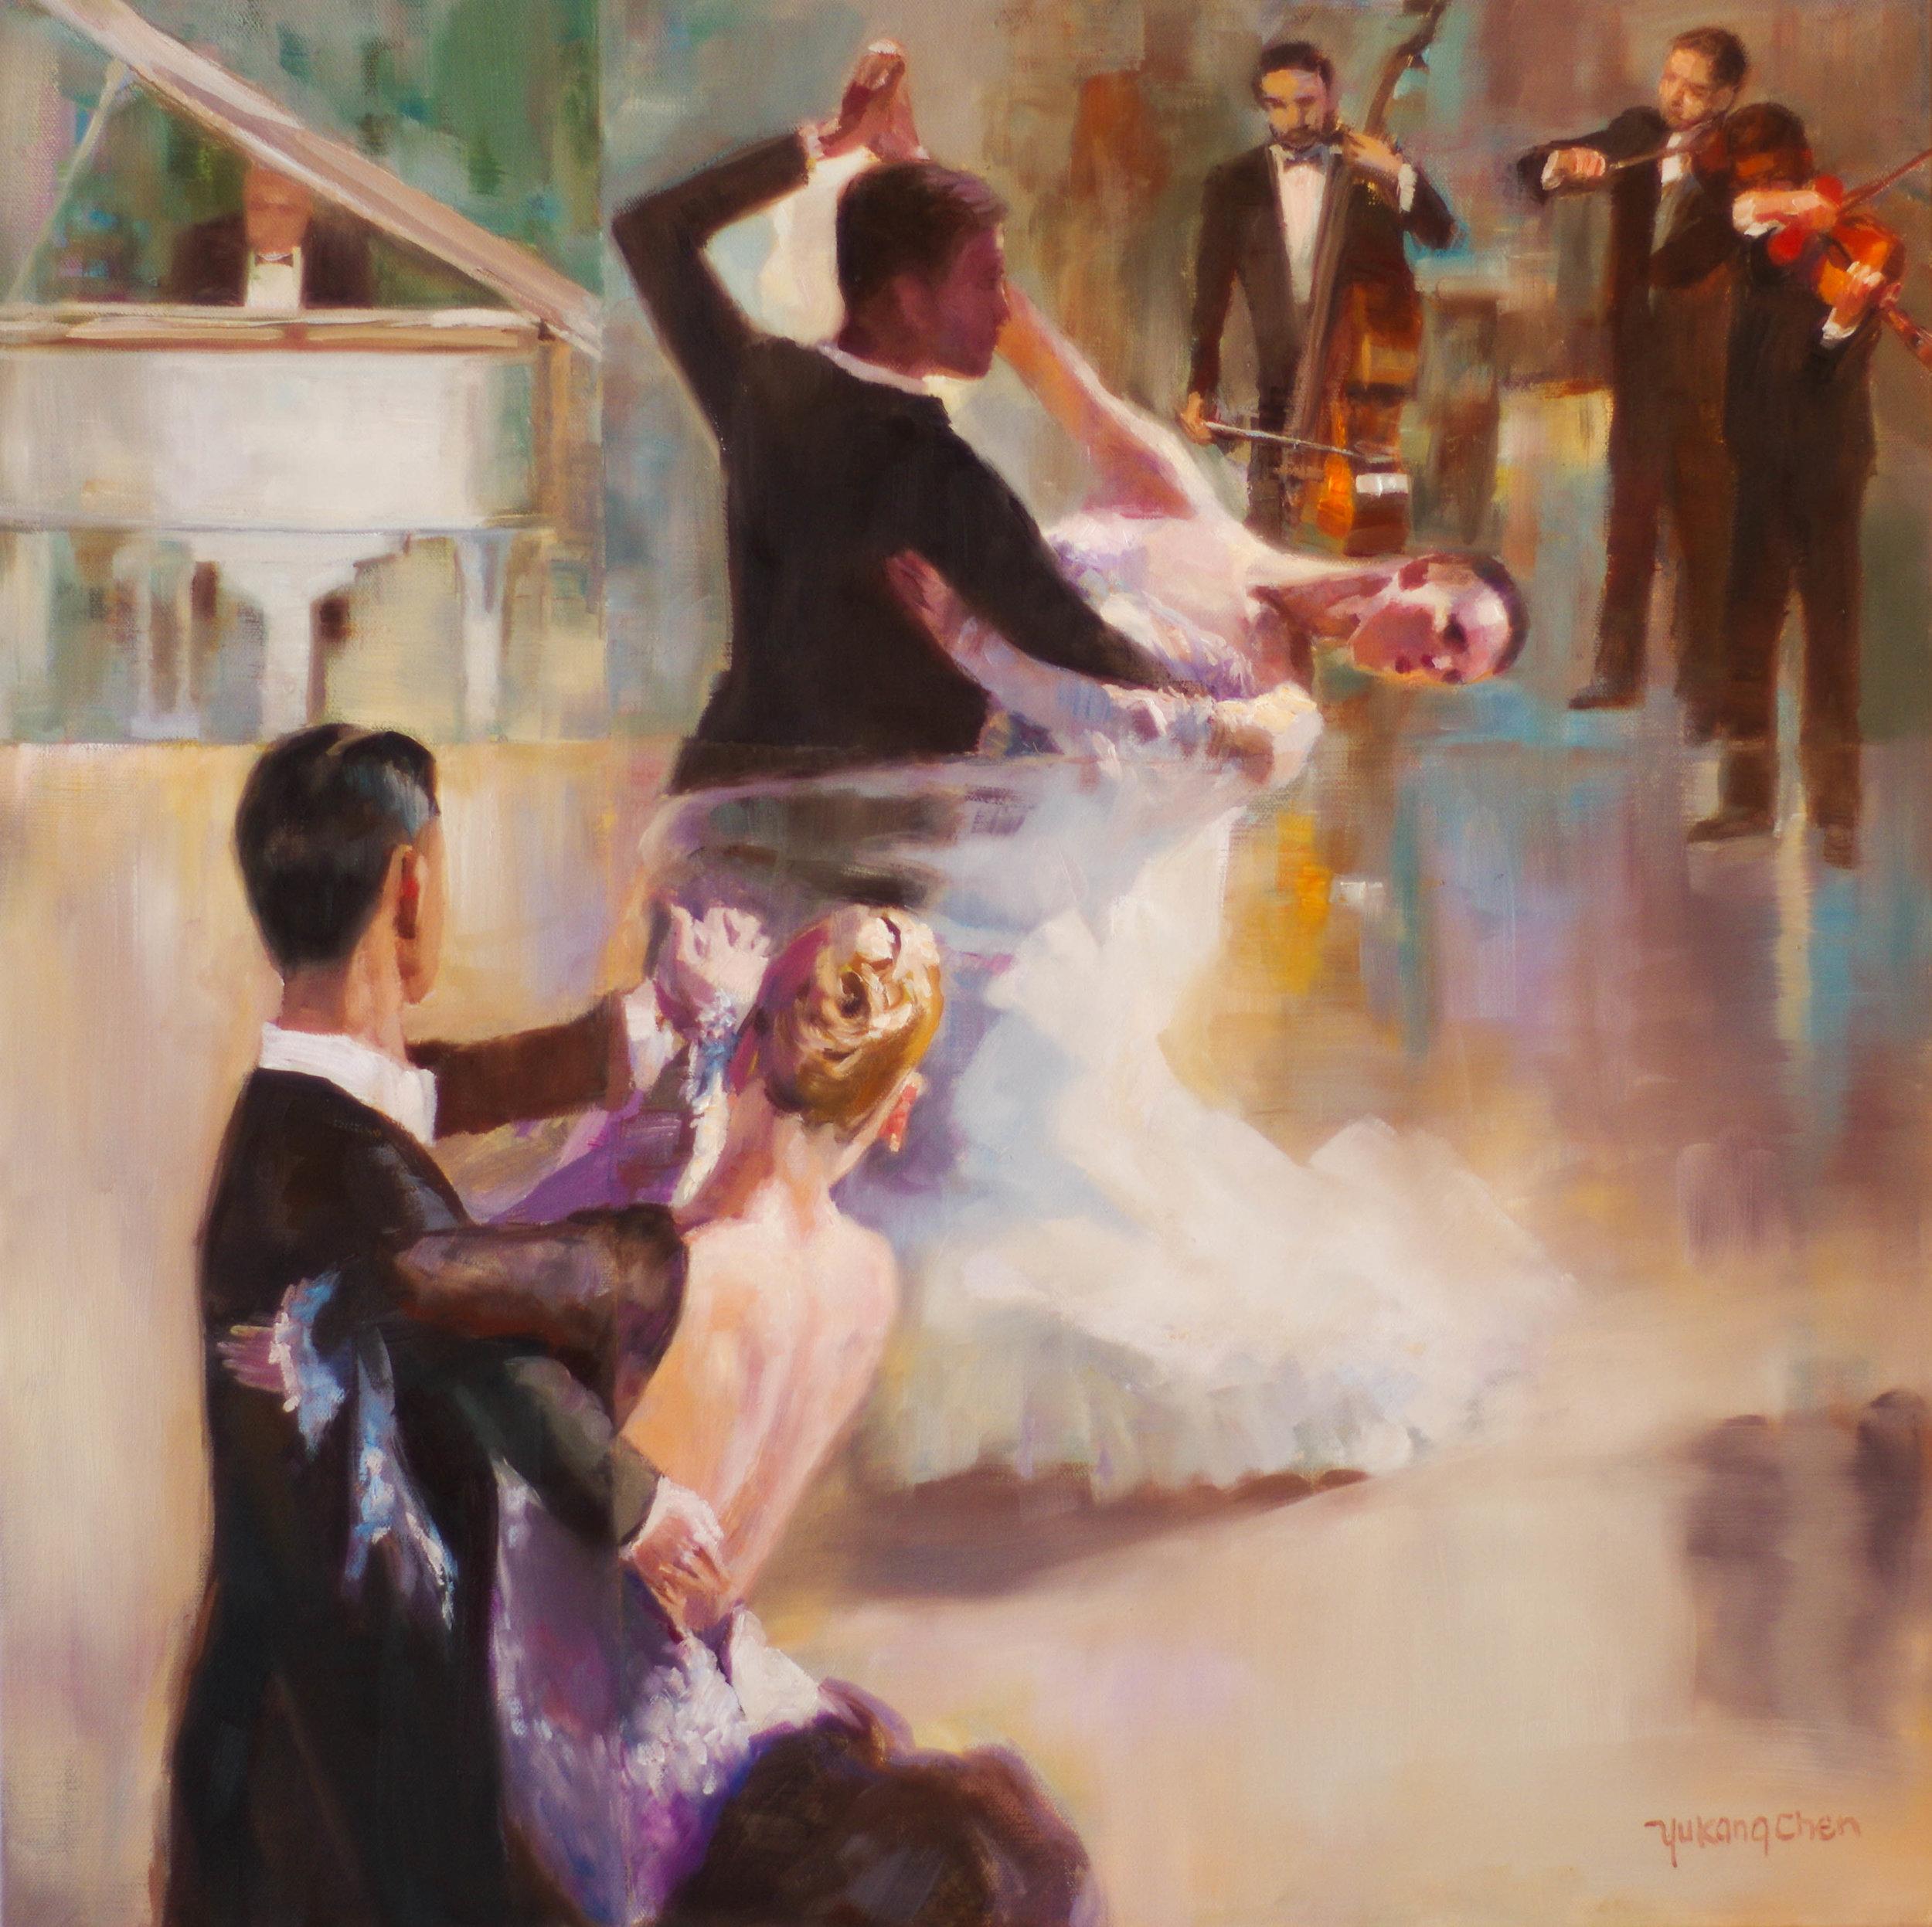 Dance Performance - S. 7